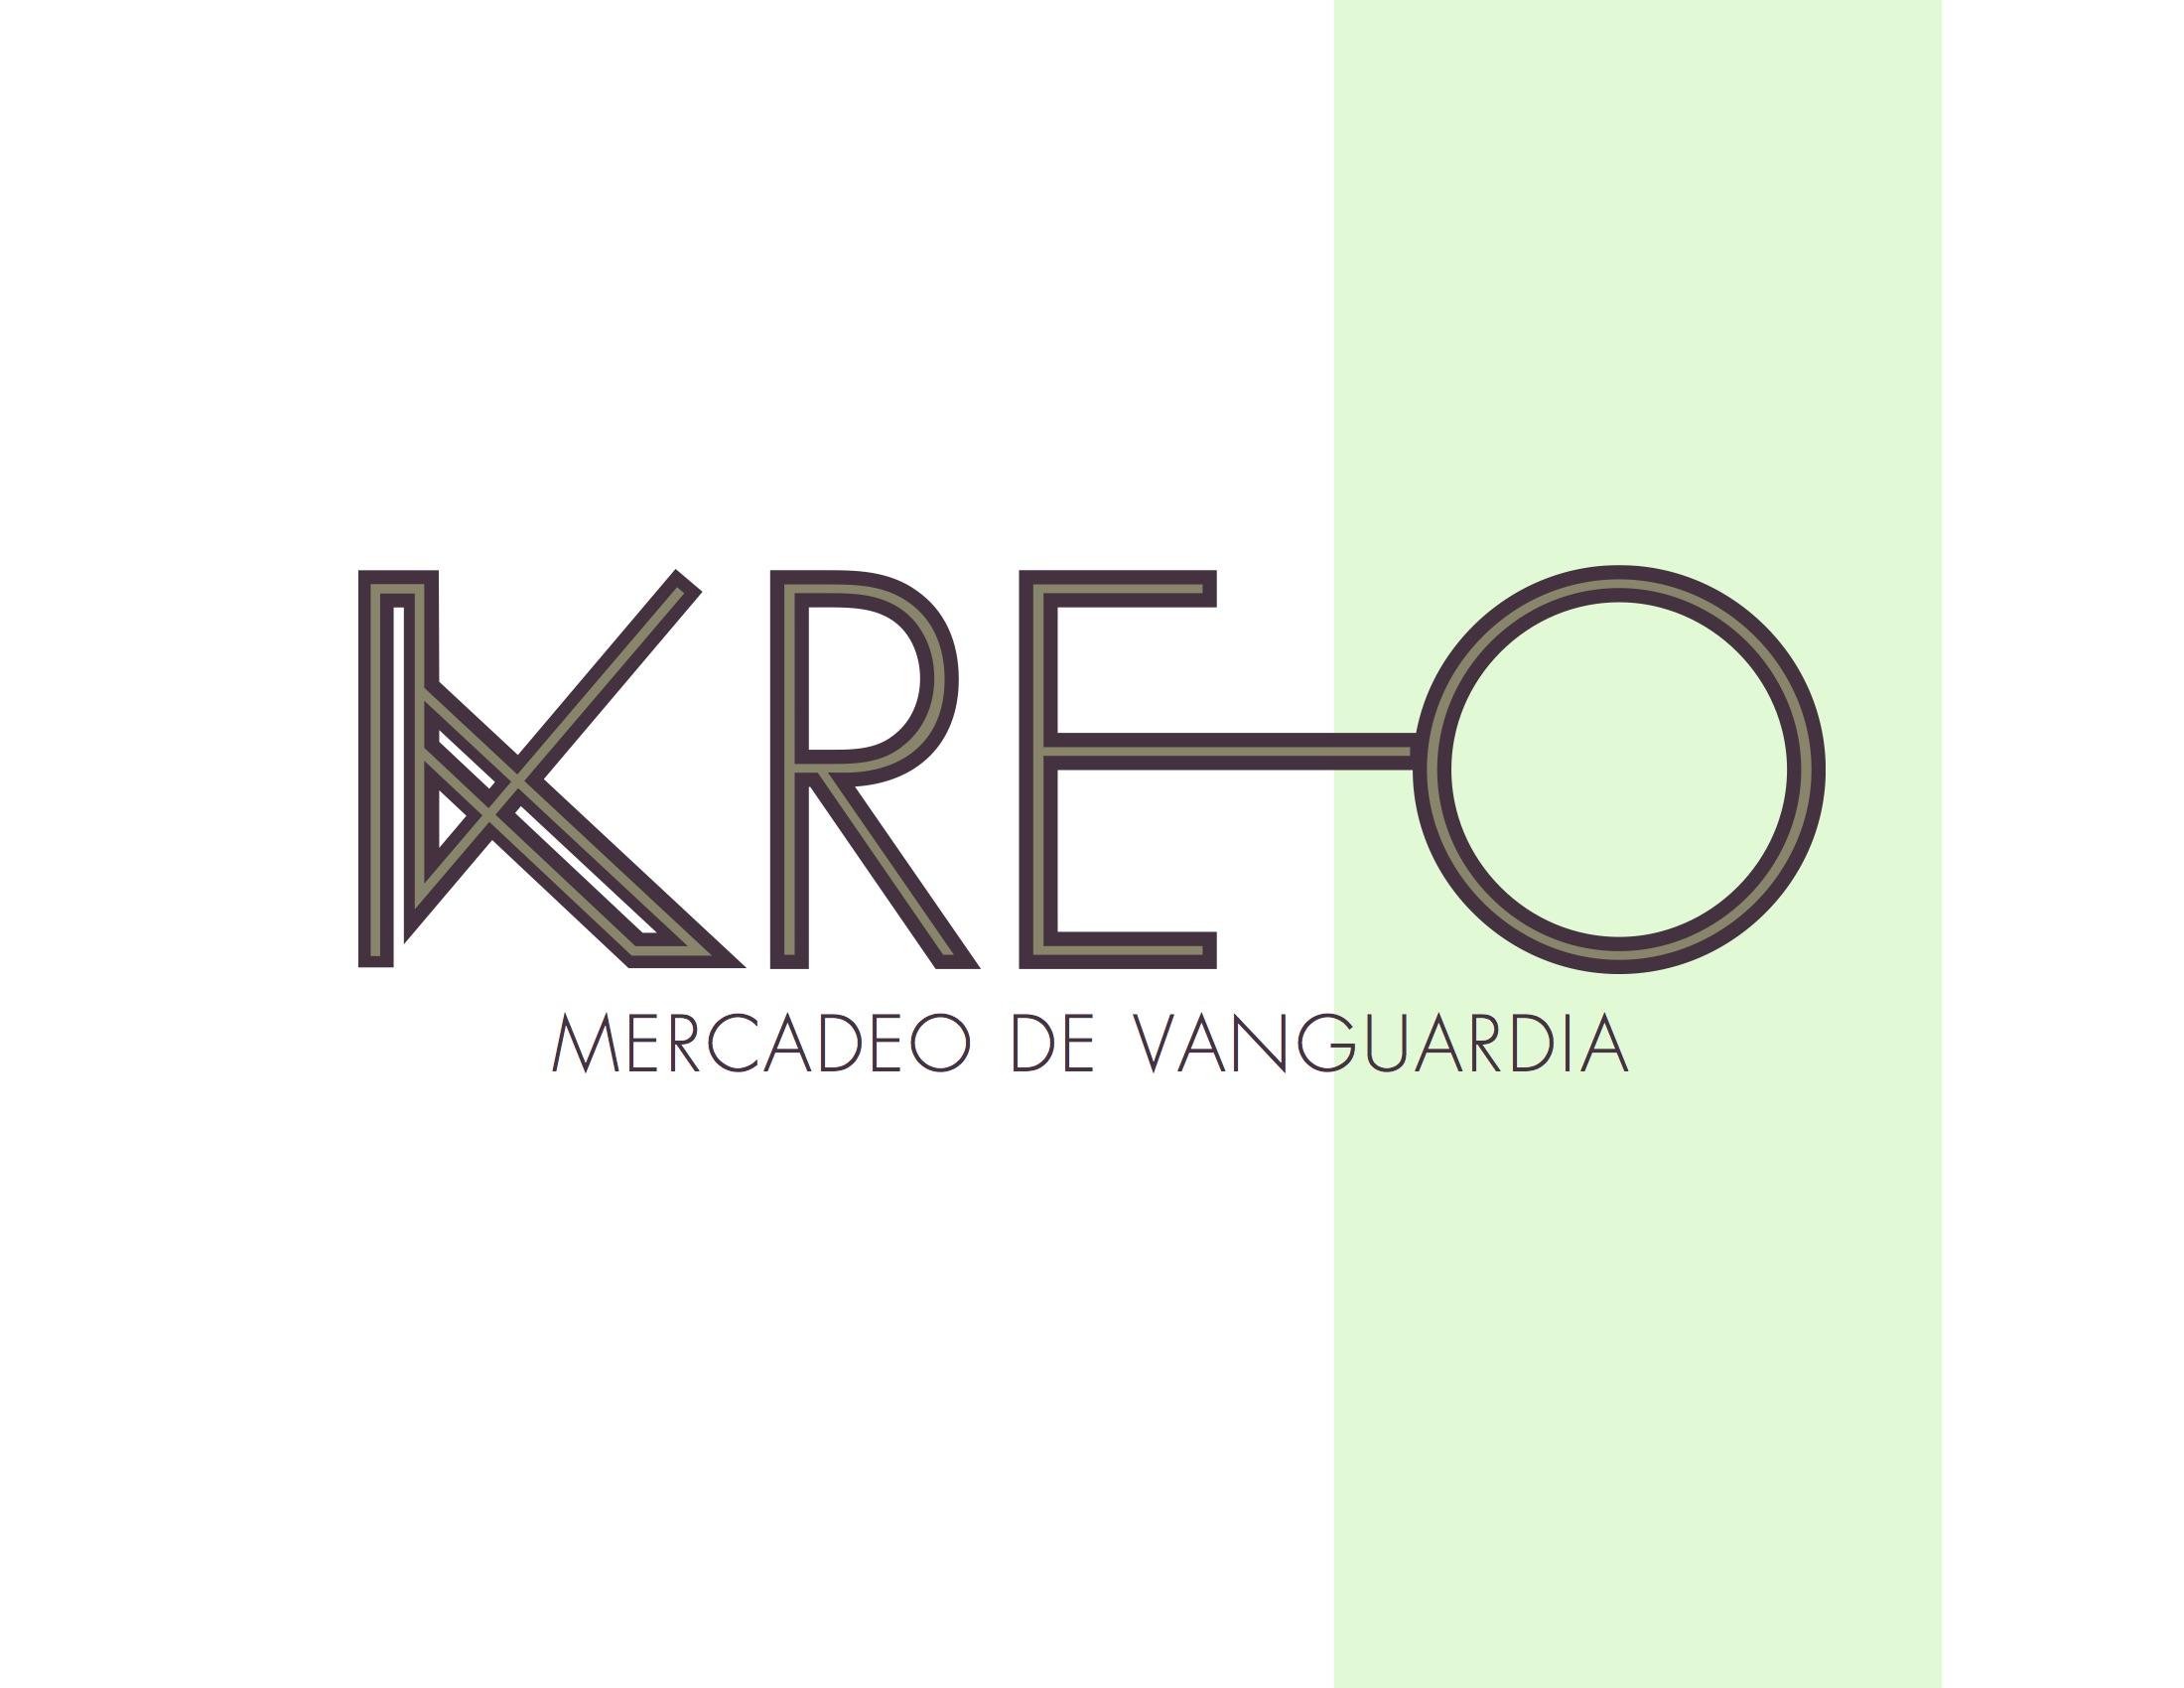 KREO_PRESENTACION.jpg